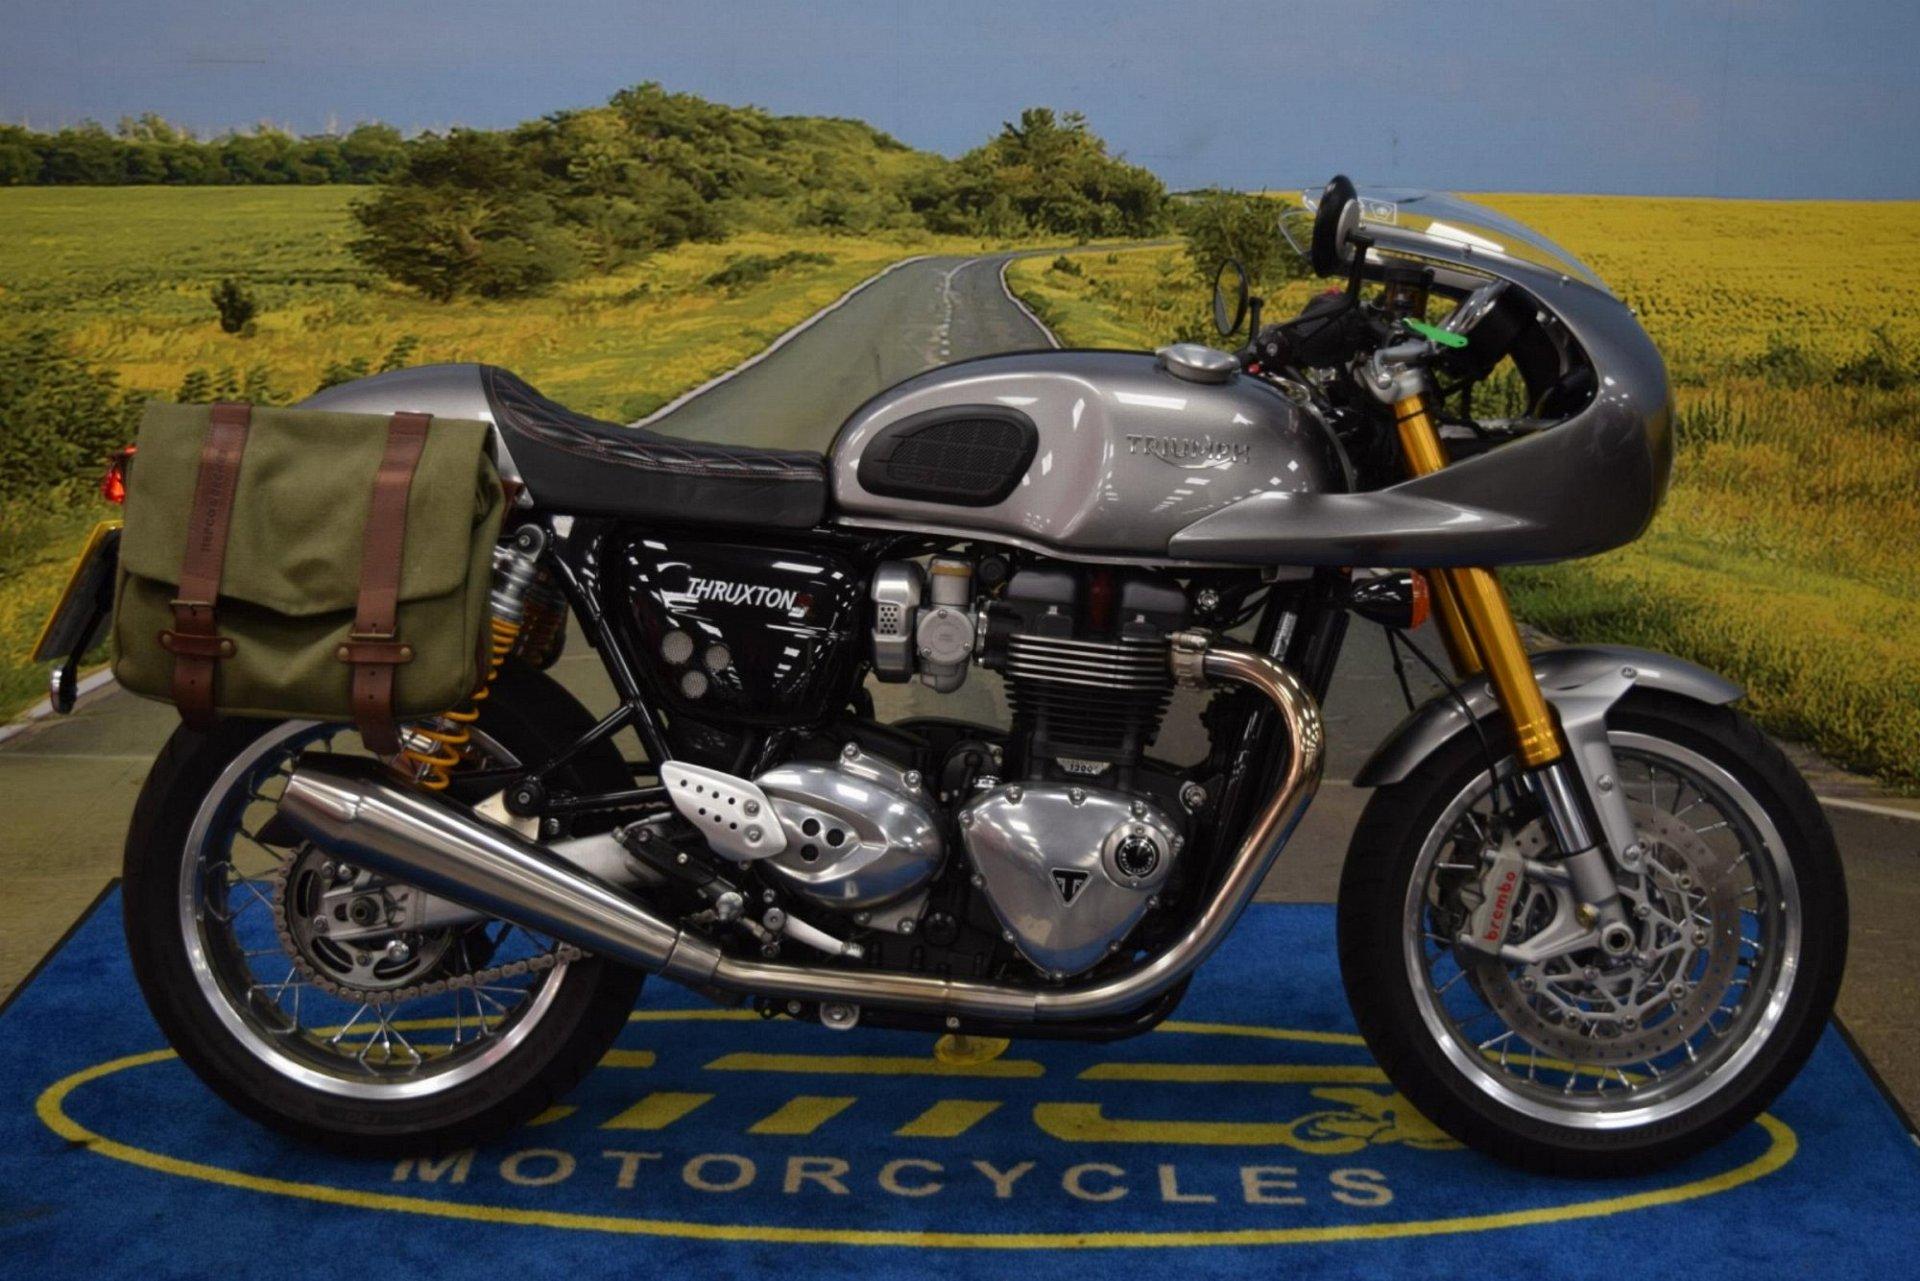 2016 Triumph Thruxton 1200 R for sale in Staffordshire